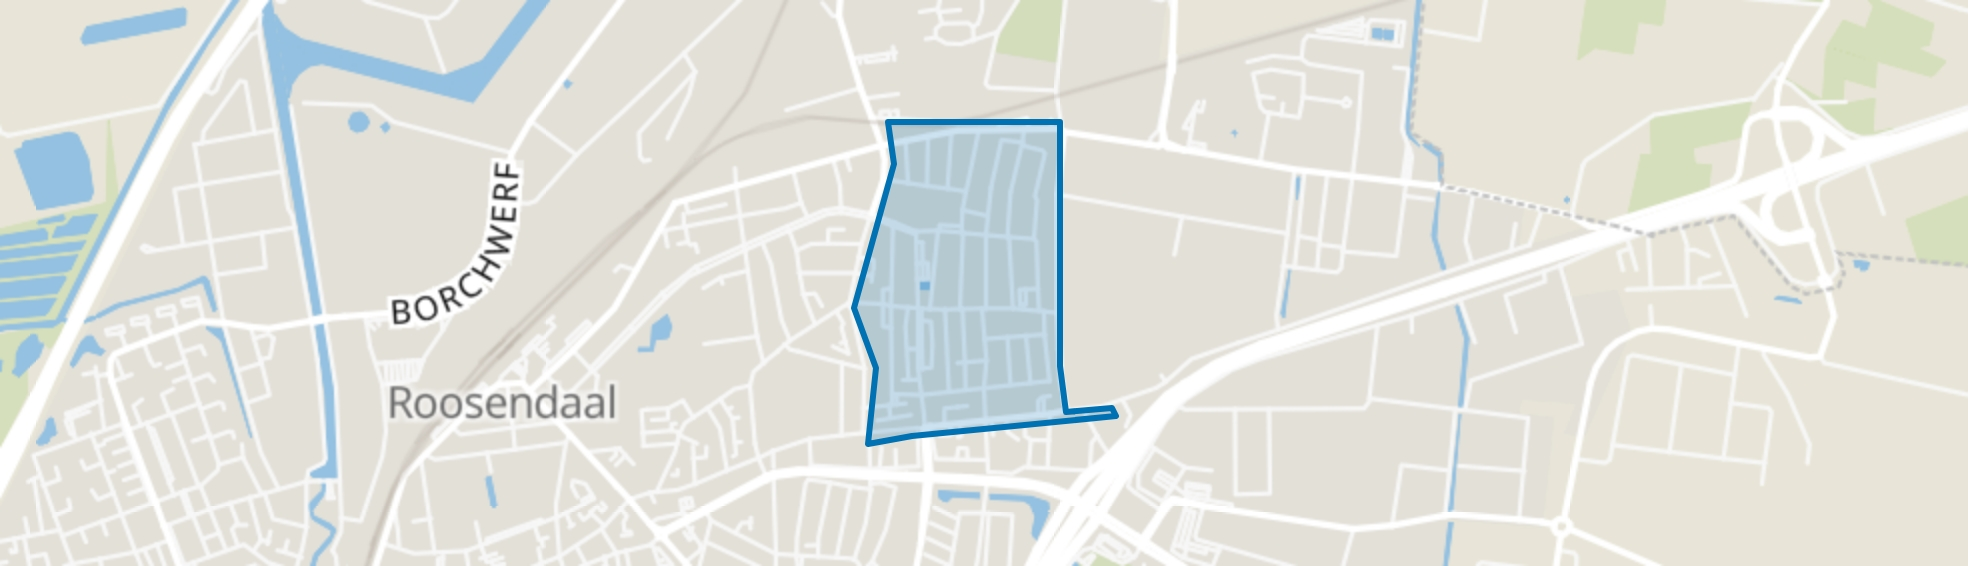 Kalsdonk, Roosendaal map